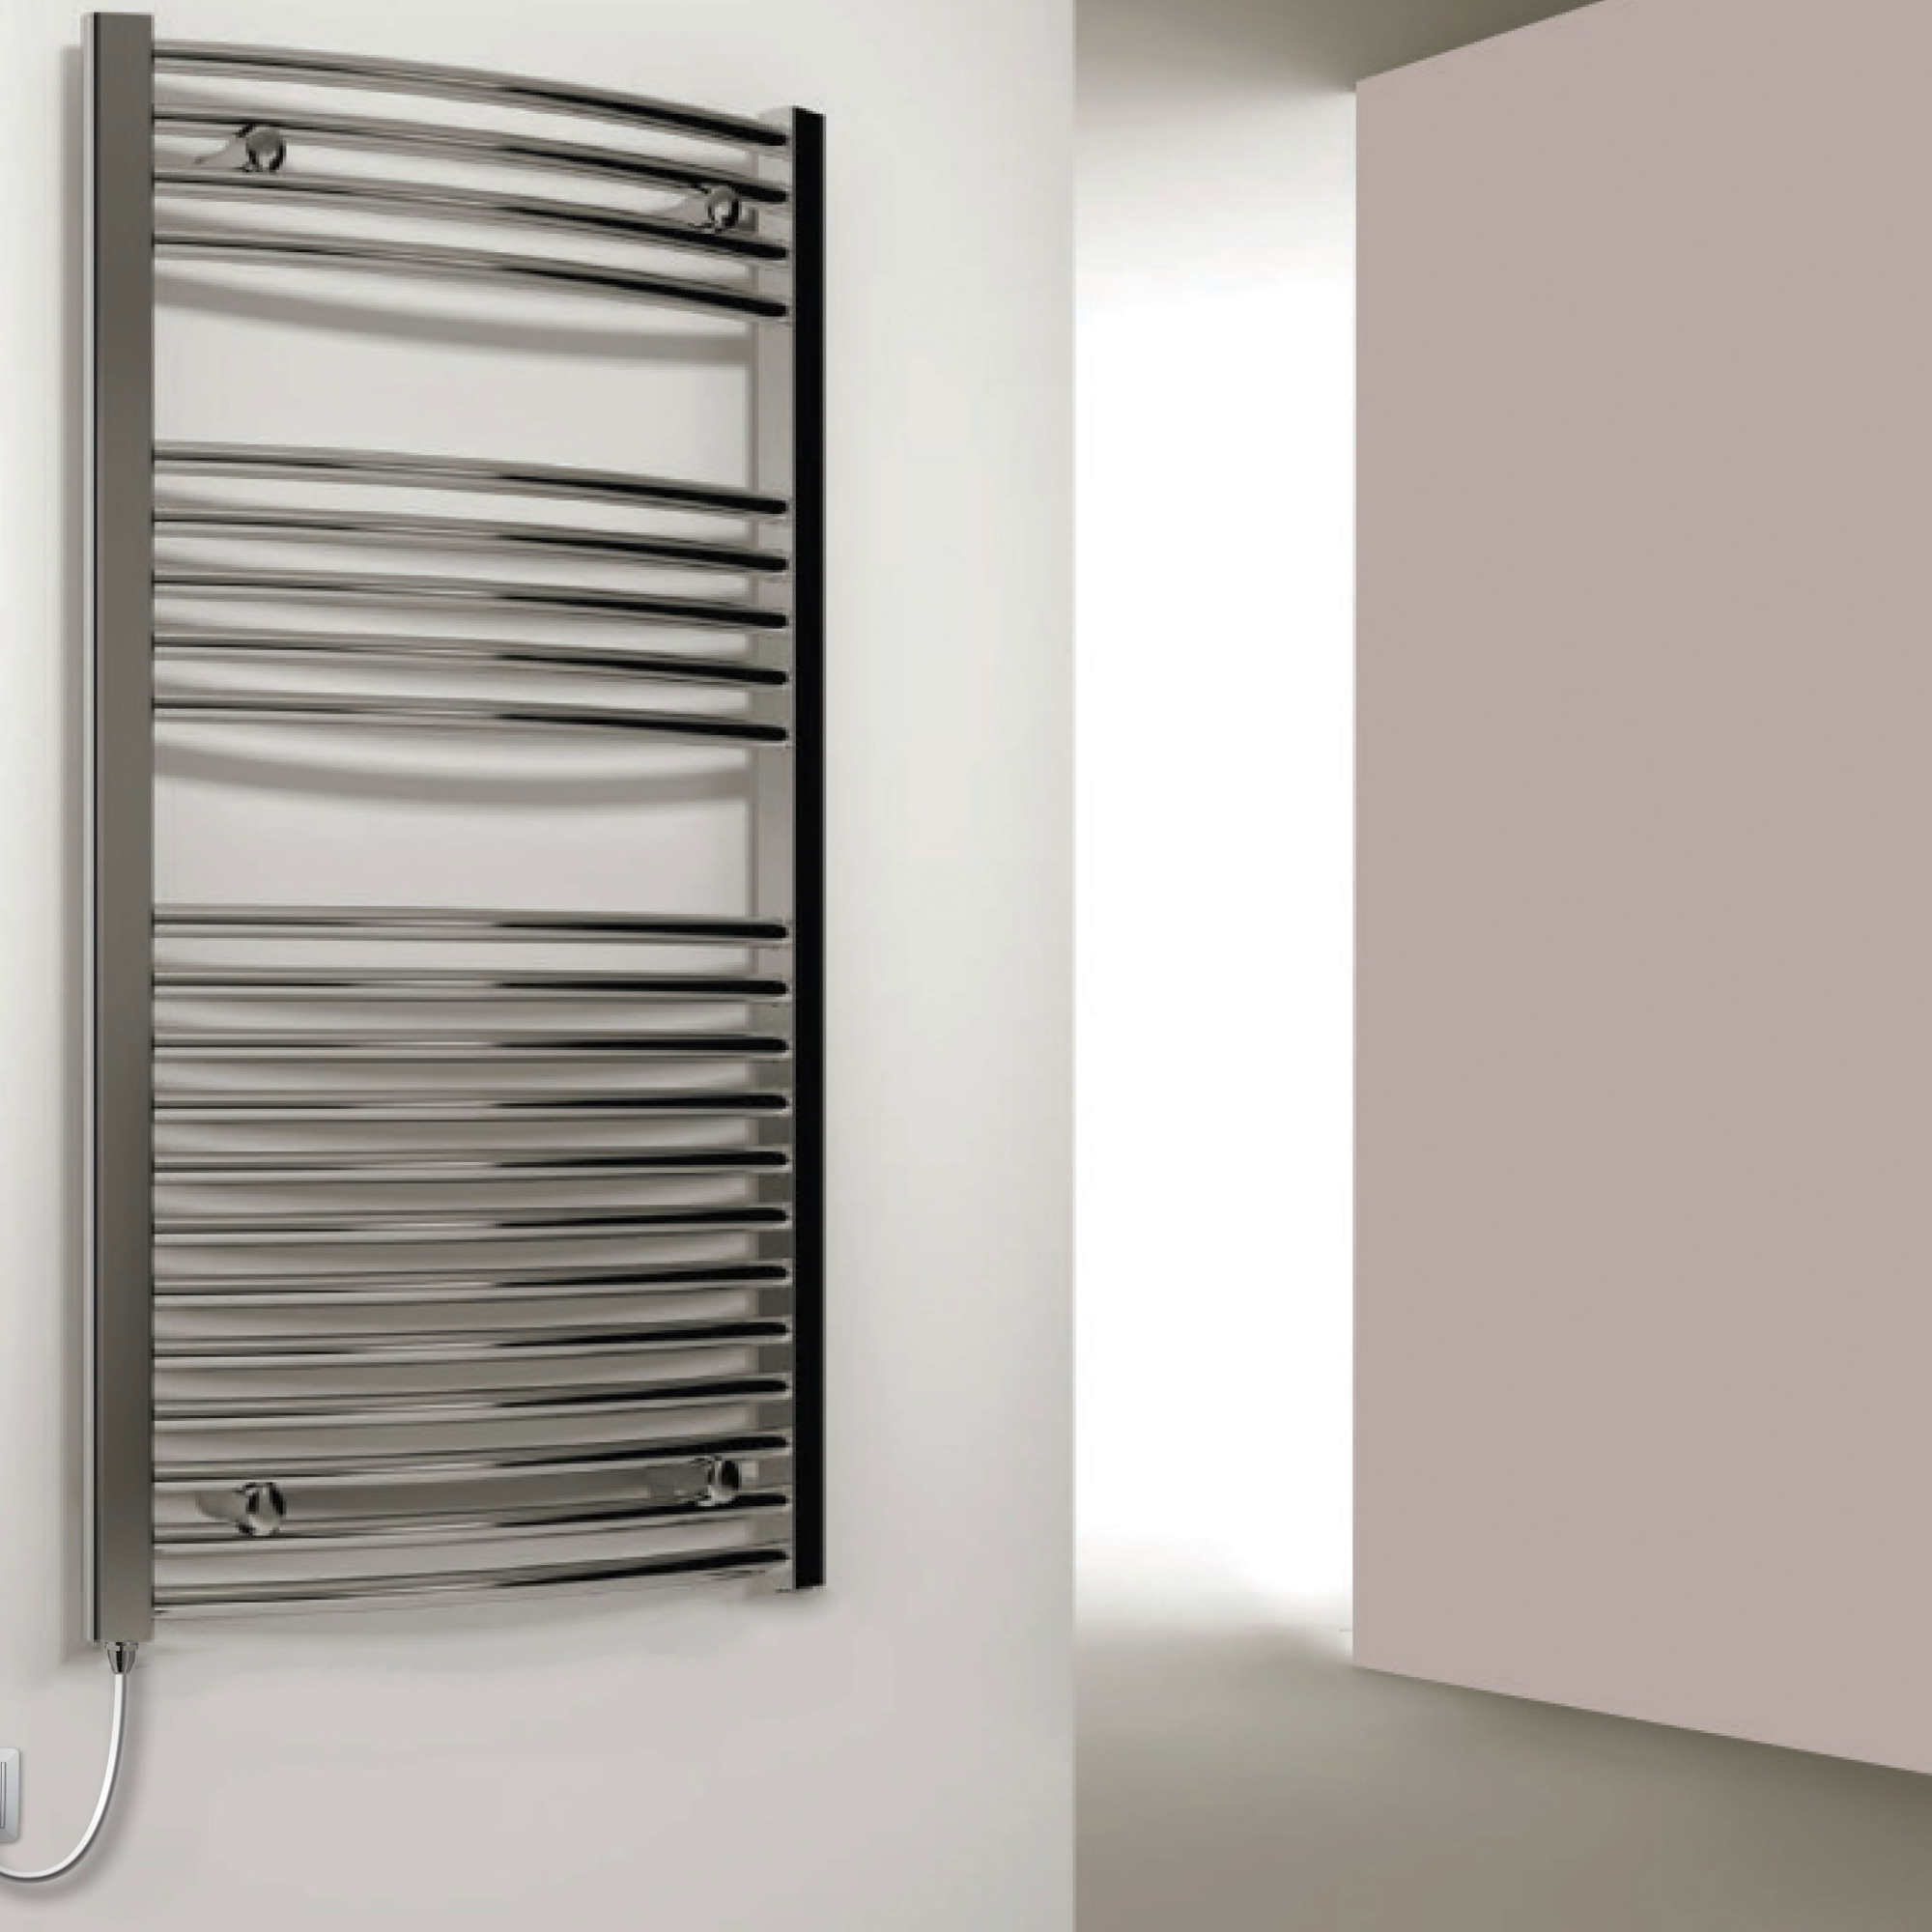 Reina Capo Curved Electric Heated Towel Rail 1600mm H x 600mm W Chrome-0